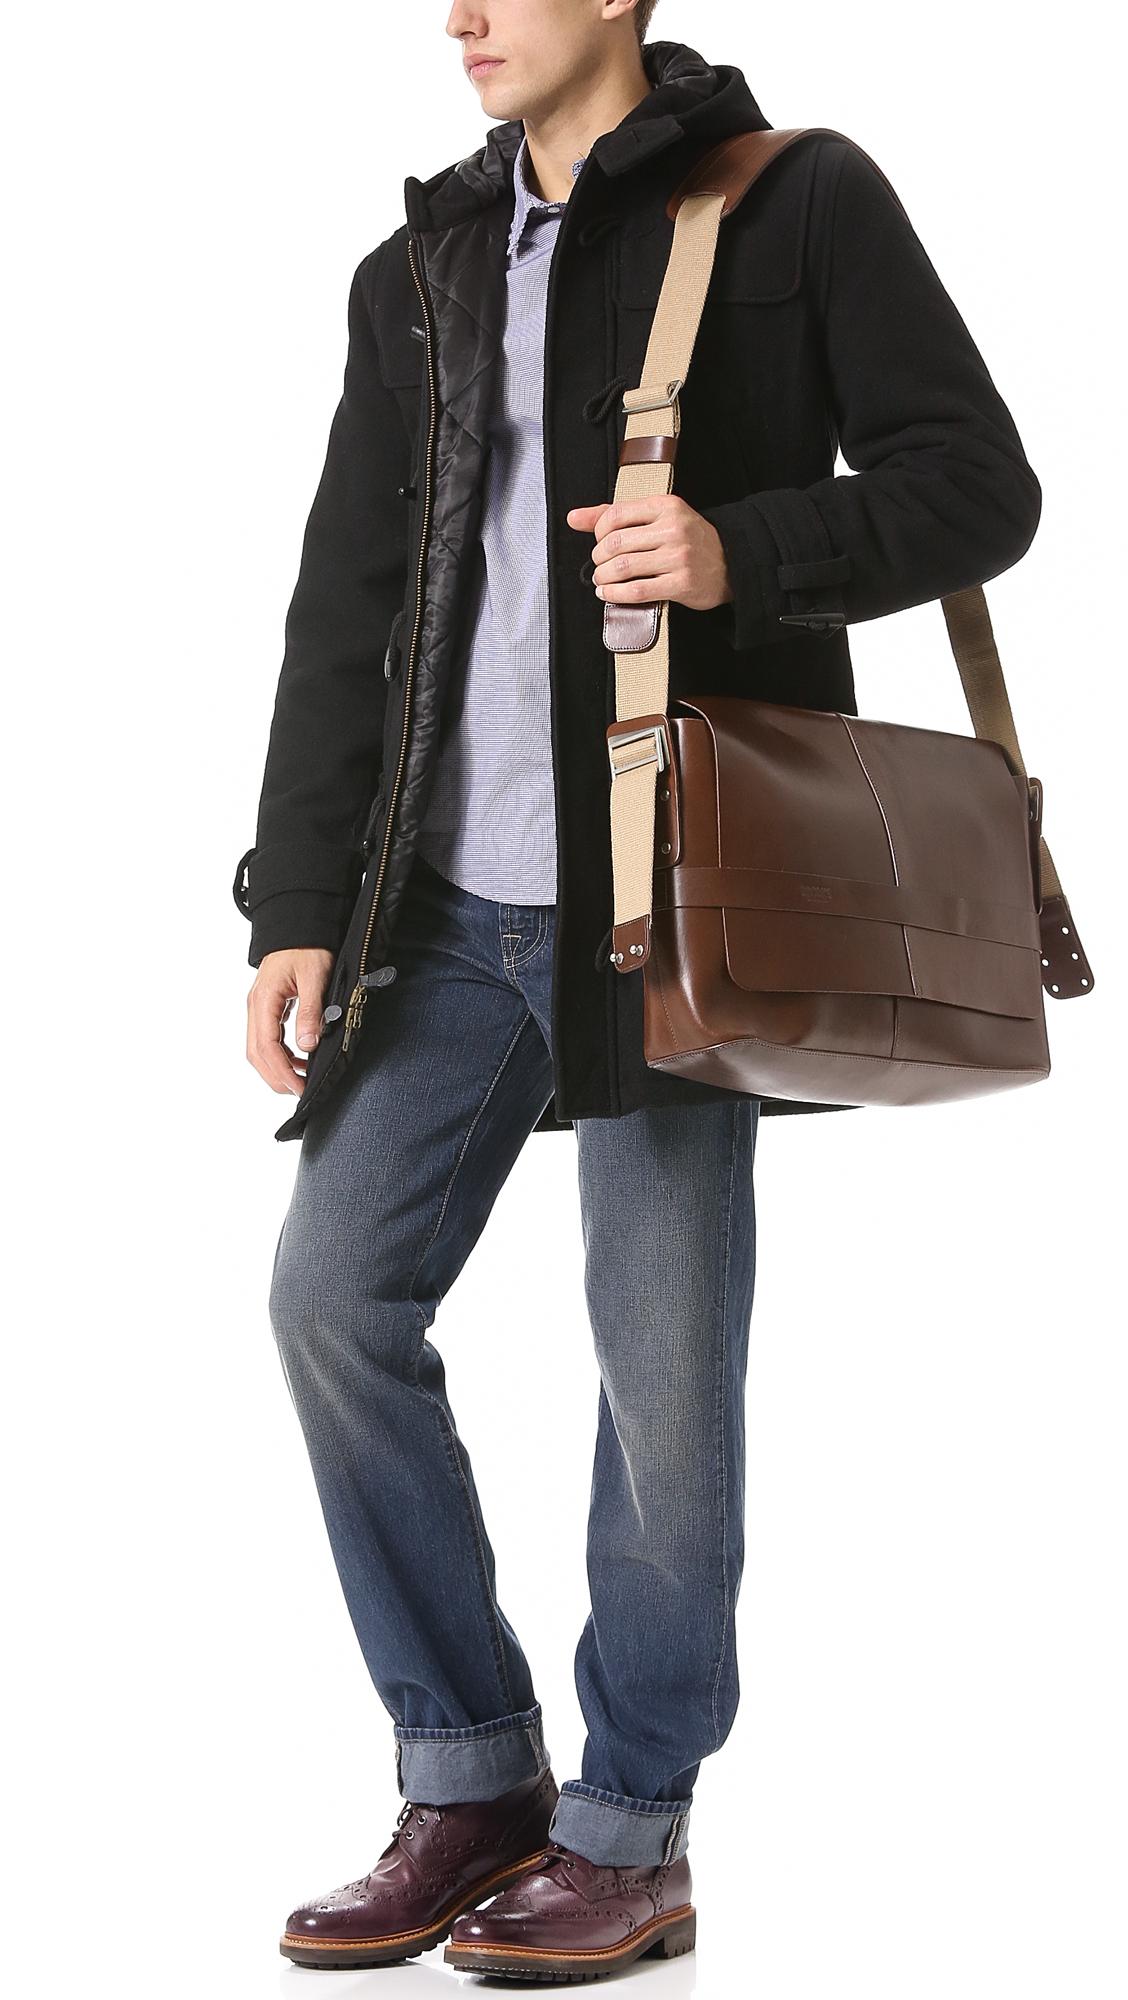 48854b4352c Brooks England Barbican Leather Messenger Bag   EAST DANE